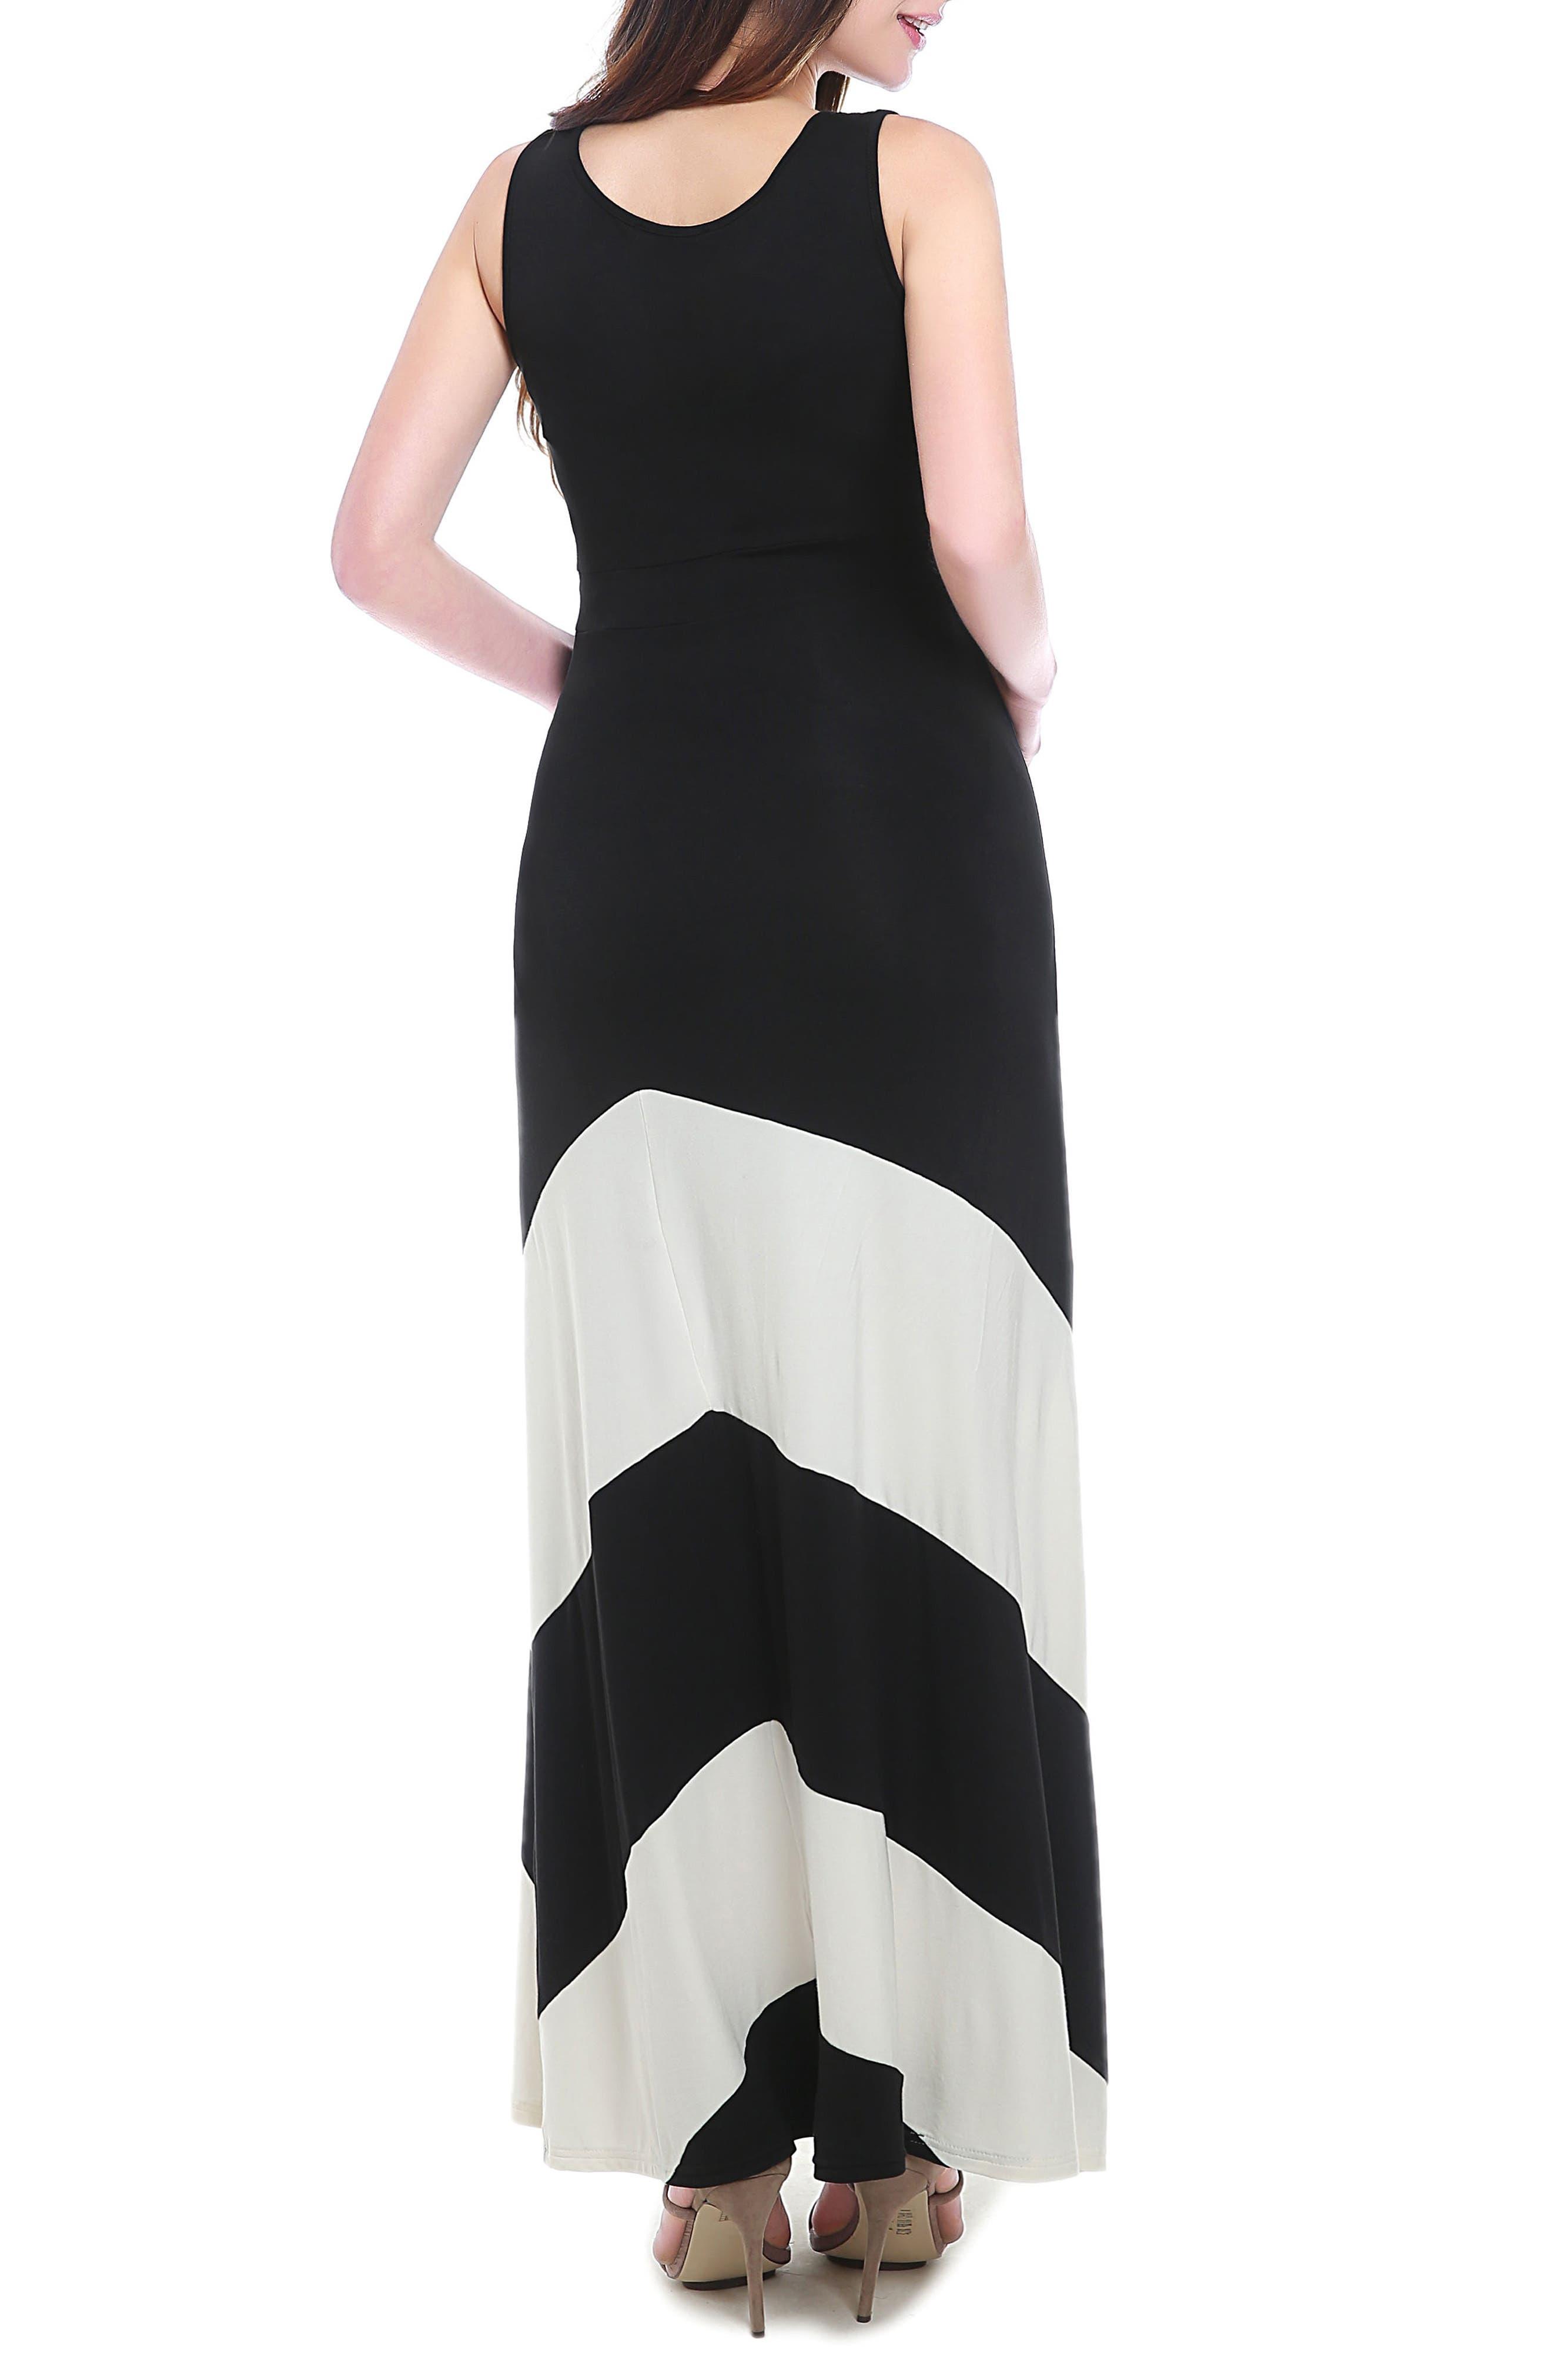 Sally Maternity Maxi Dress,                             Alternate thumbnail 2, color,                             BLACK/ WHITE